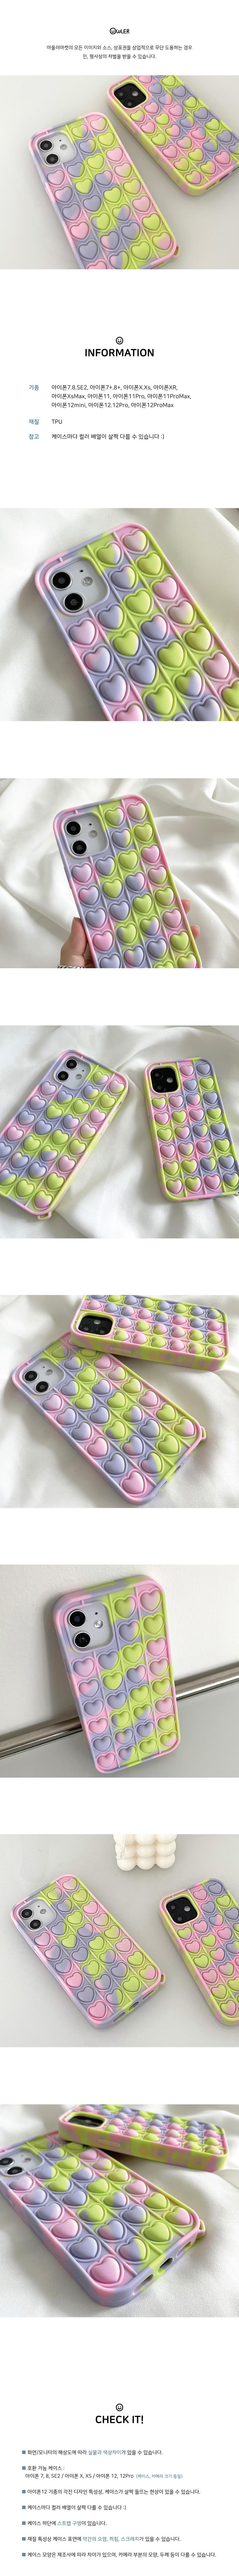 Heart pattern push pop bubble push iphone case